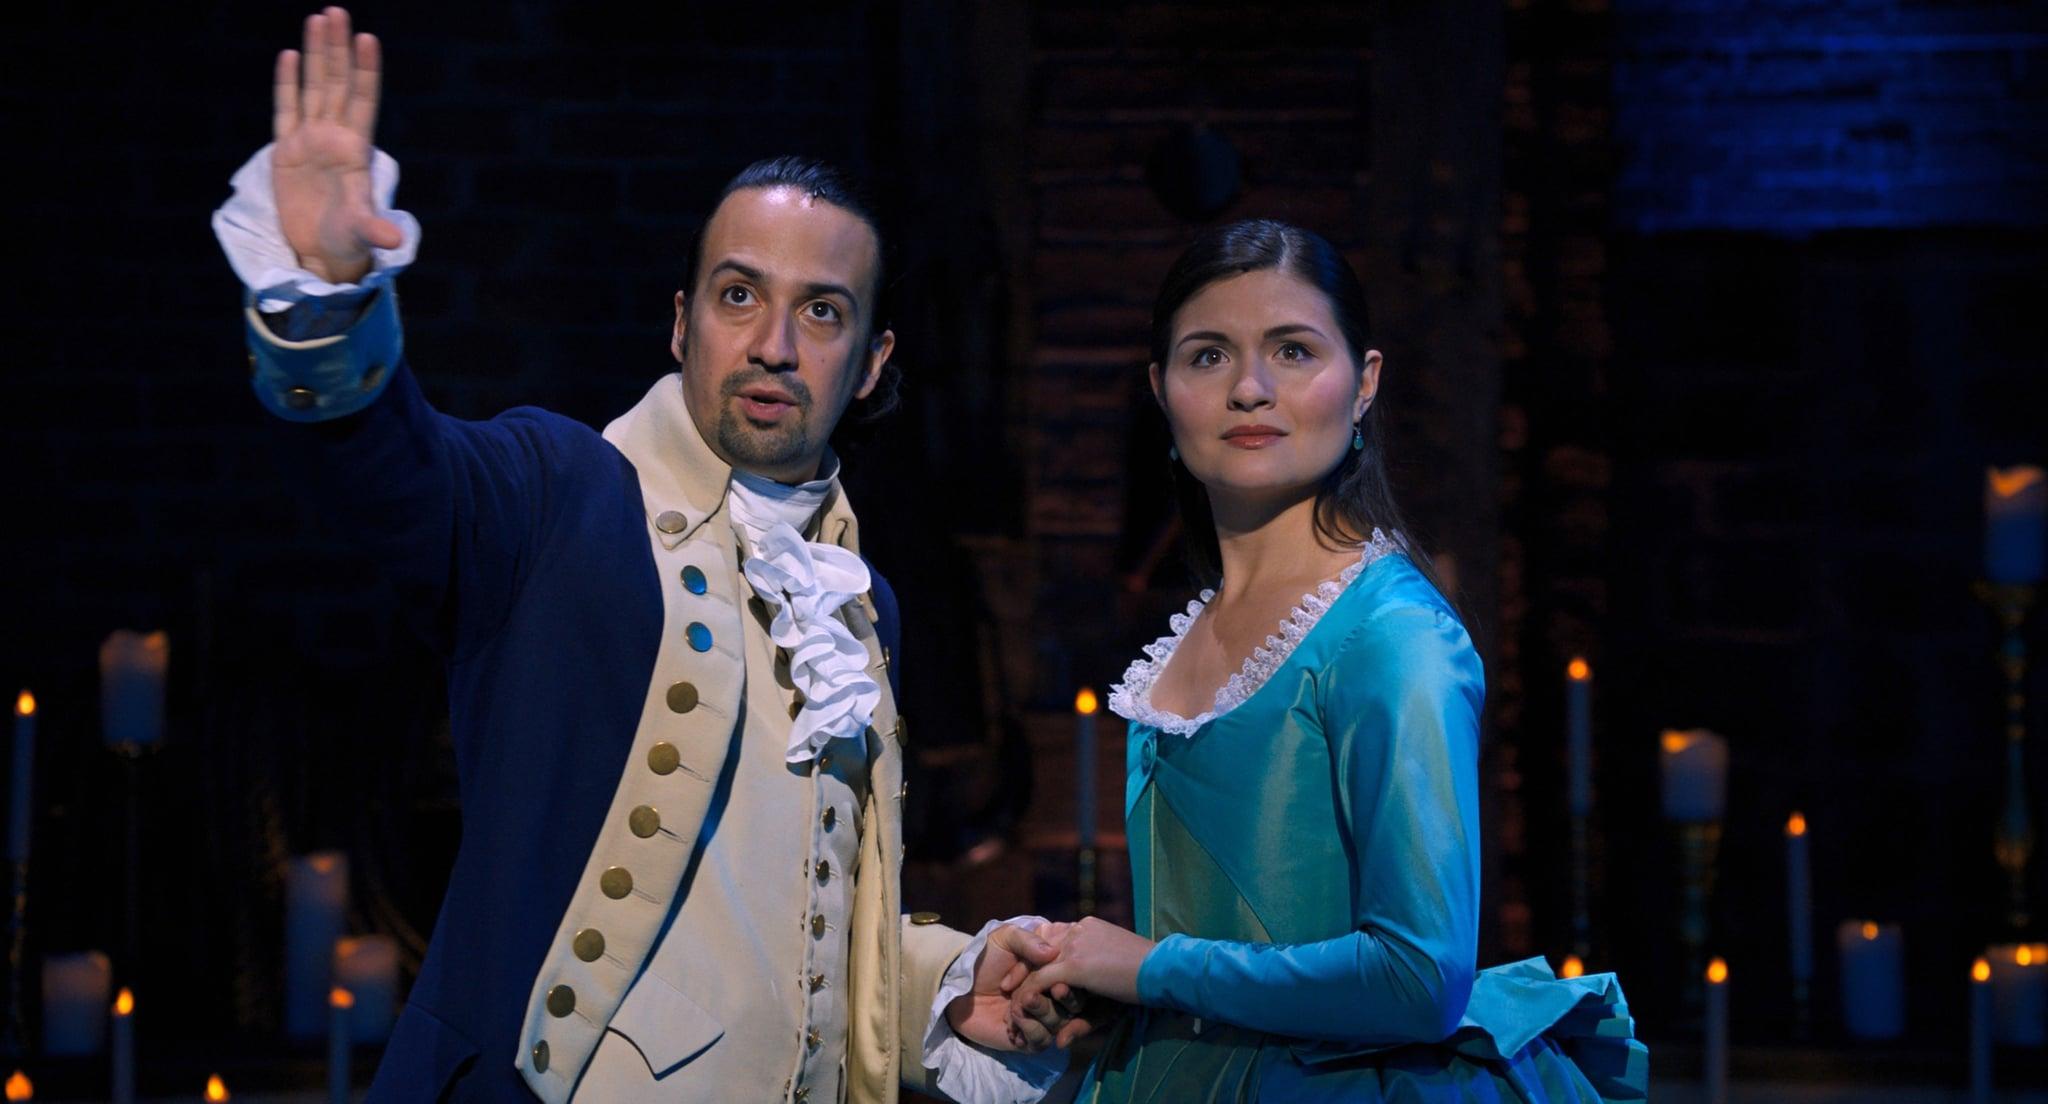 HAMILTON, from left: Lin-Manuel Miranda as Alexander Hamilton, Phillipa Soo as Eliza Hamilton, 2020.  Disney+ / Courtesy Everett Collection